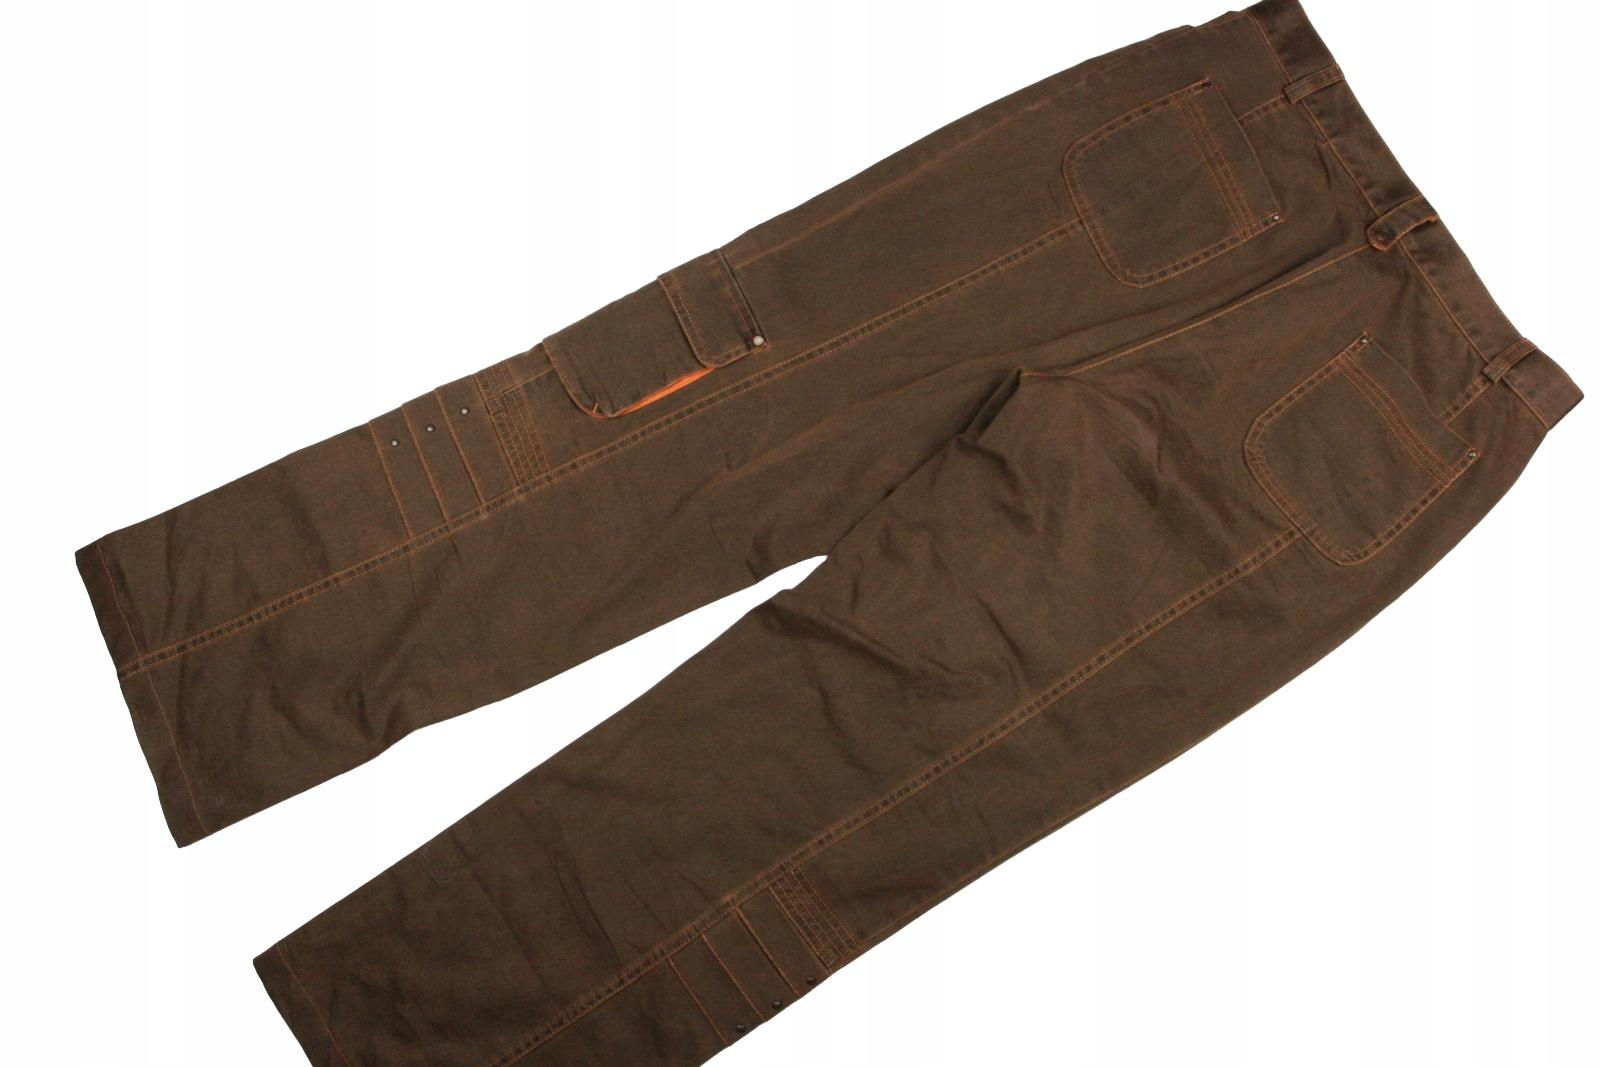 4fc409a2c9 BIBA garnitur CASUAL JEANS spodnie UNIKALNY 40 L - 7645642325 ...